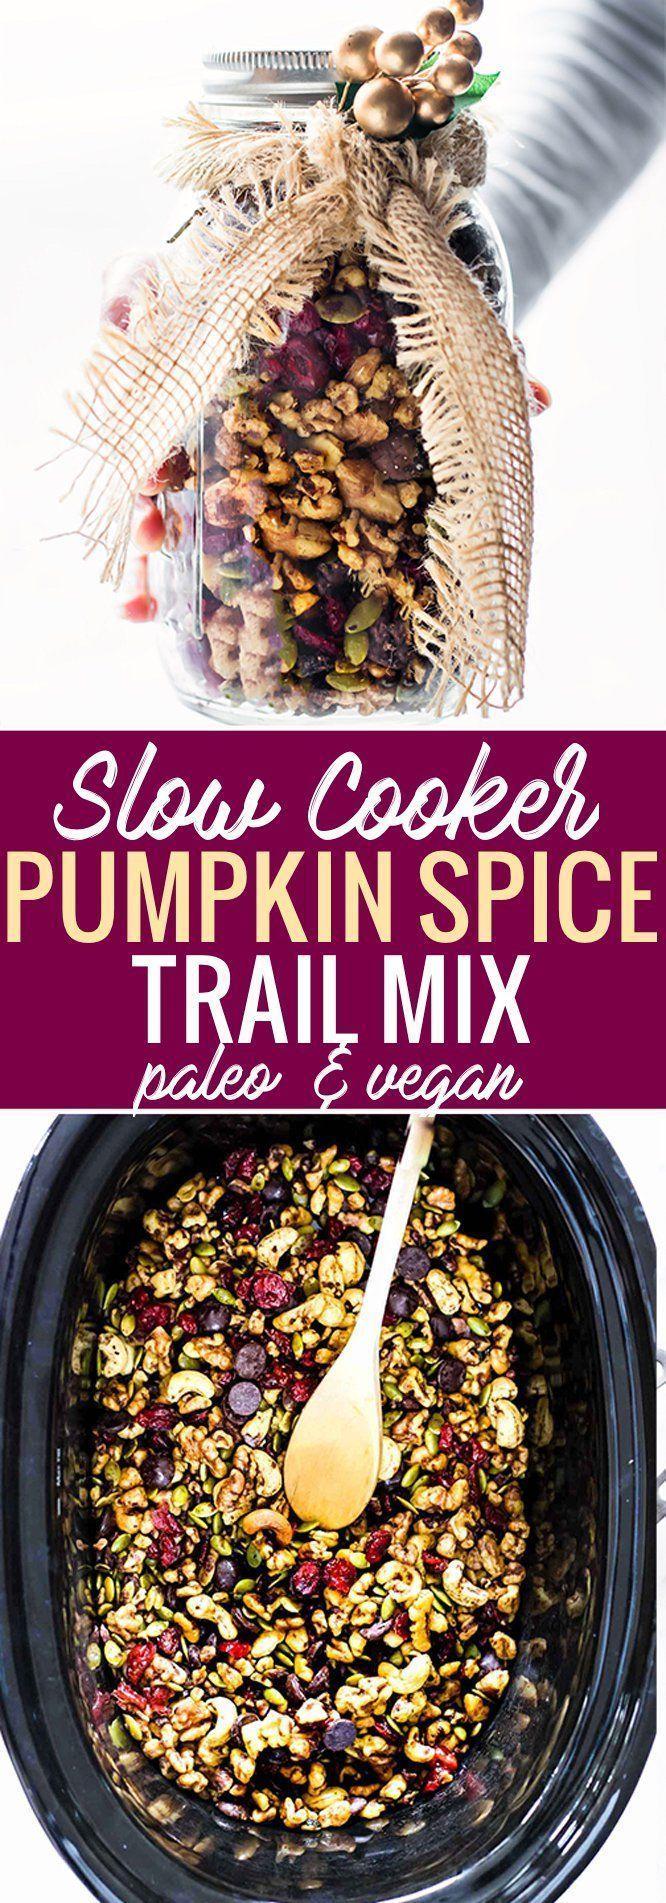 Slow Cooker Pumpkin Spice Trail Mix (Paleo, Vegan Friendly)